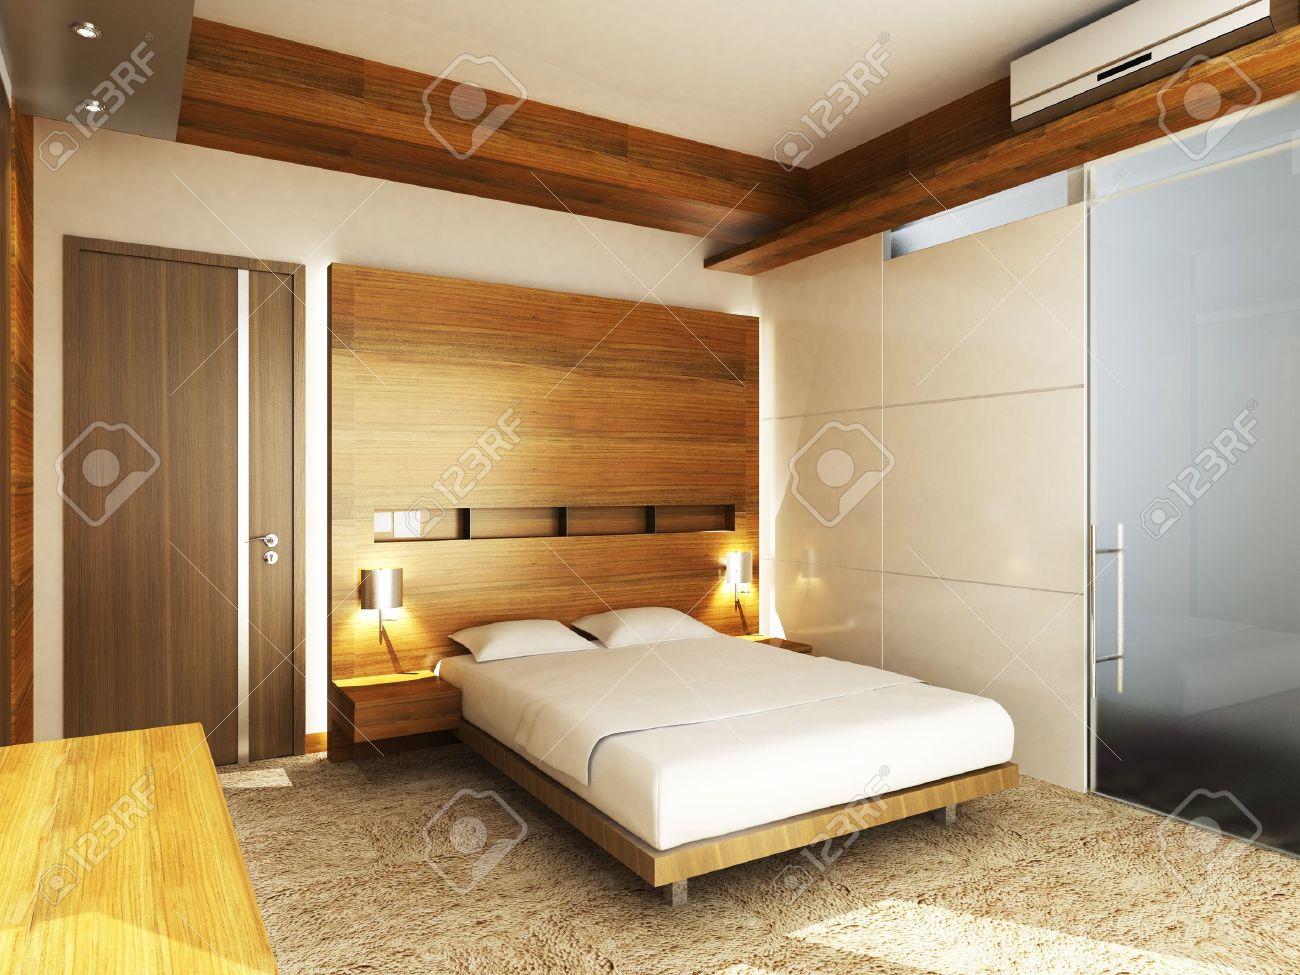 Lifestyle Bedroom Furniture Stylish Lifestyle Bedroom Stock Photos Images Royalty Free